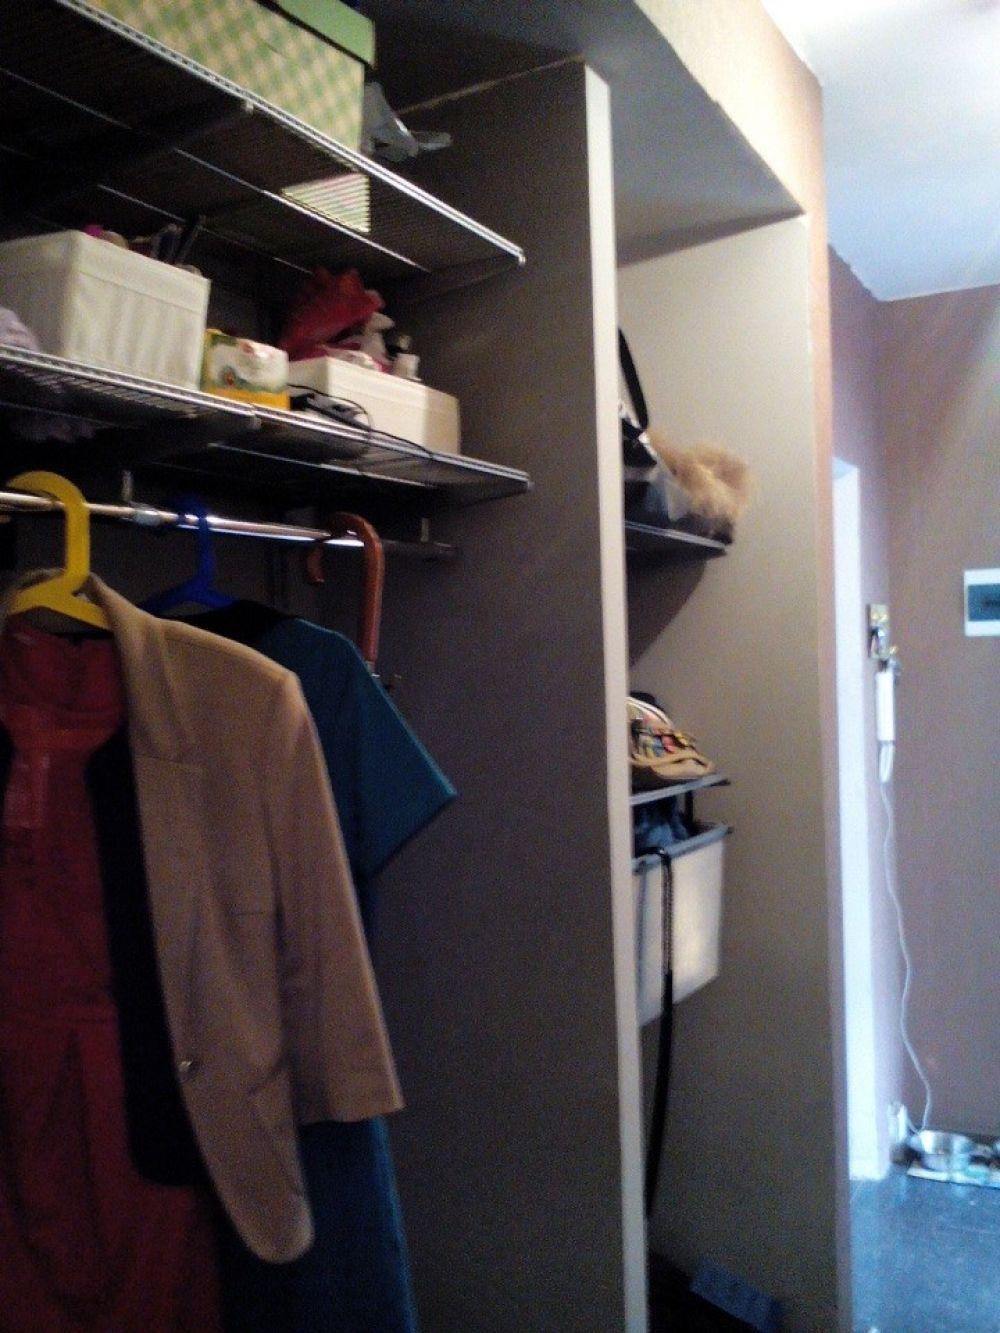 Однокомнатная квартира 30 м2, Богородский 19, фото 5